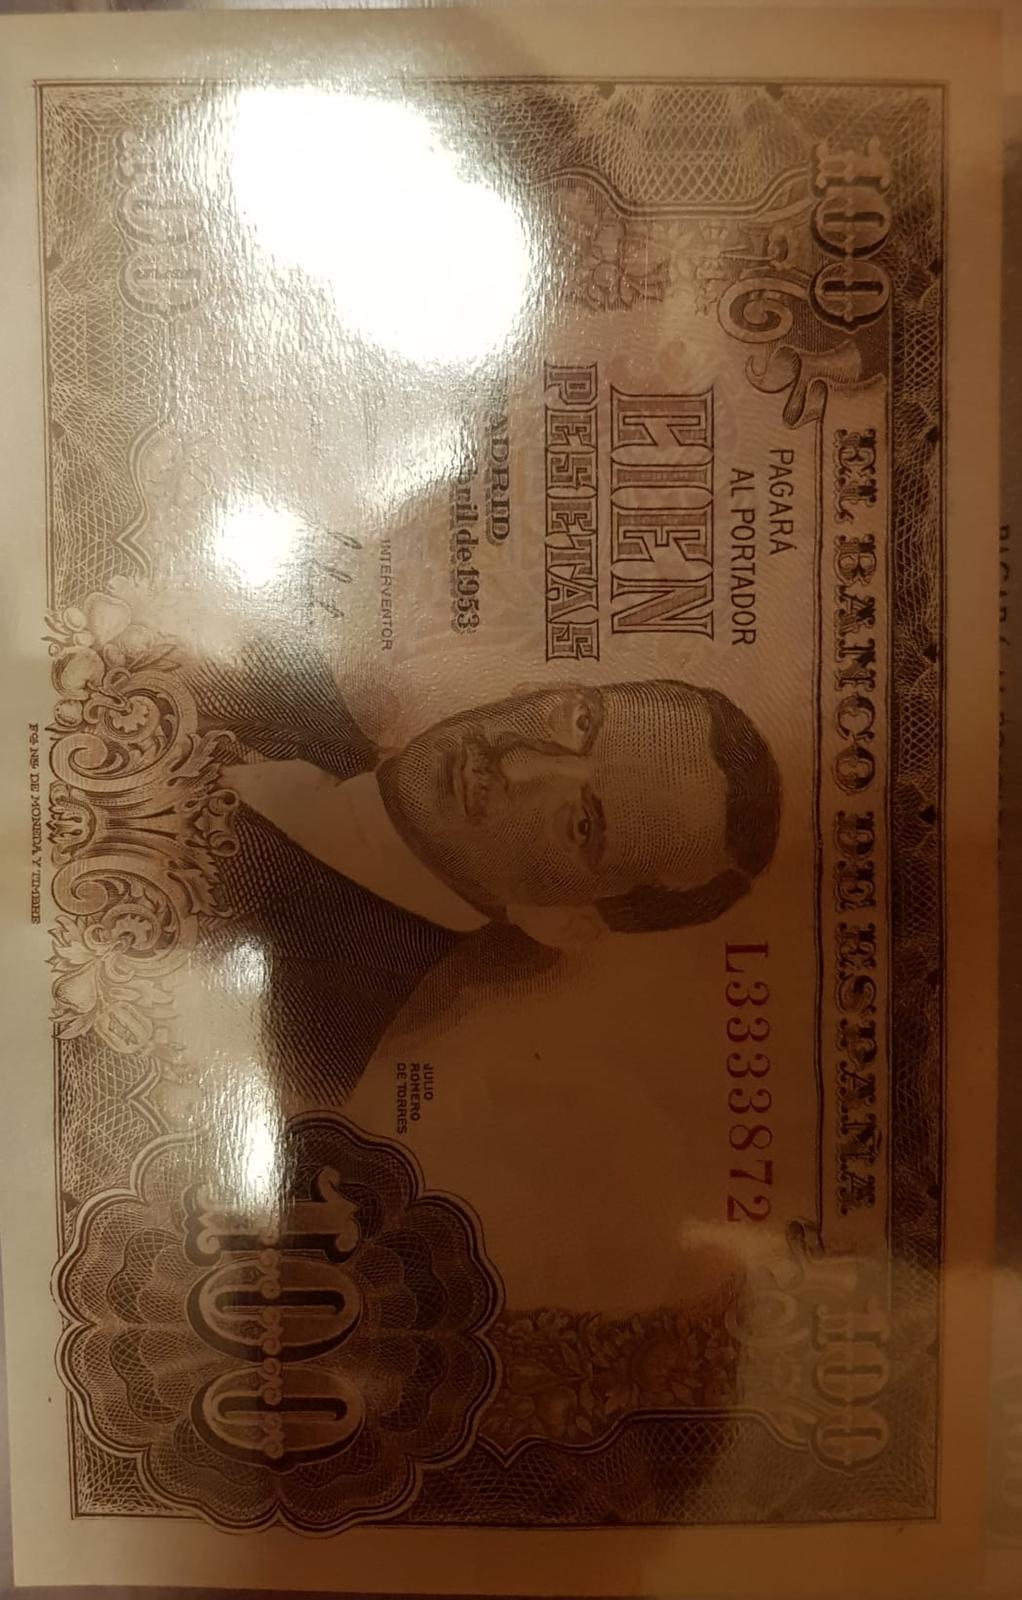 Investigación - Billetes de 100 pts 1953 Romero de Torres 100_pt10